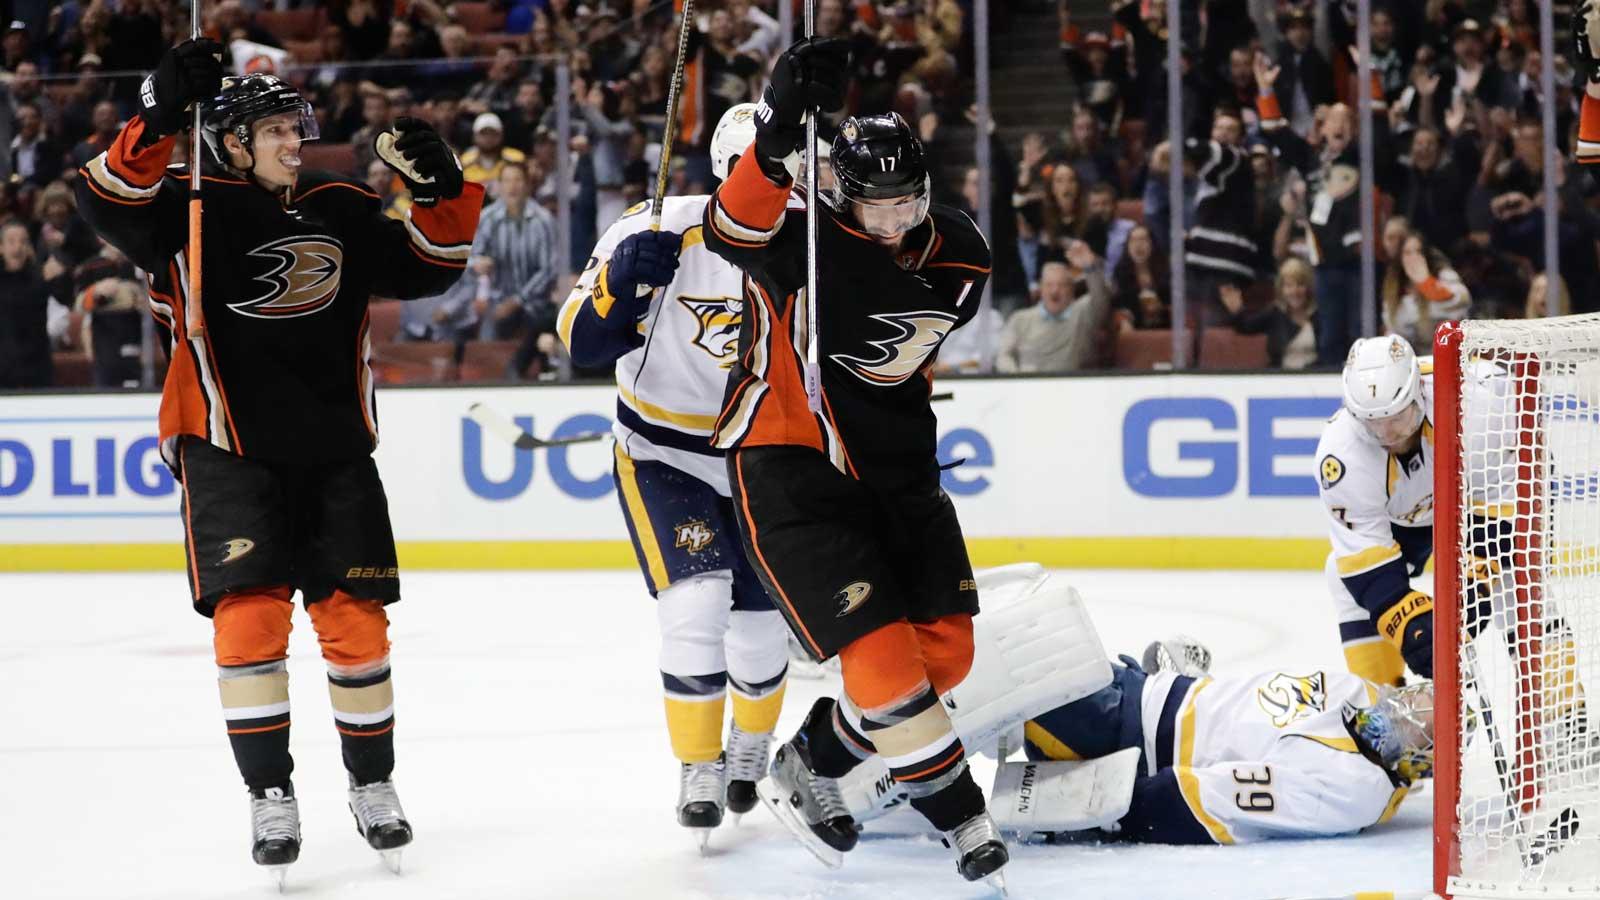 Silfverberg's 2 goals lead Ducks over Predators 6-1